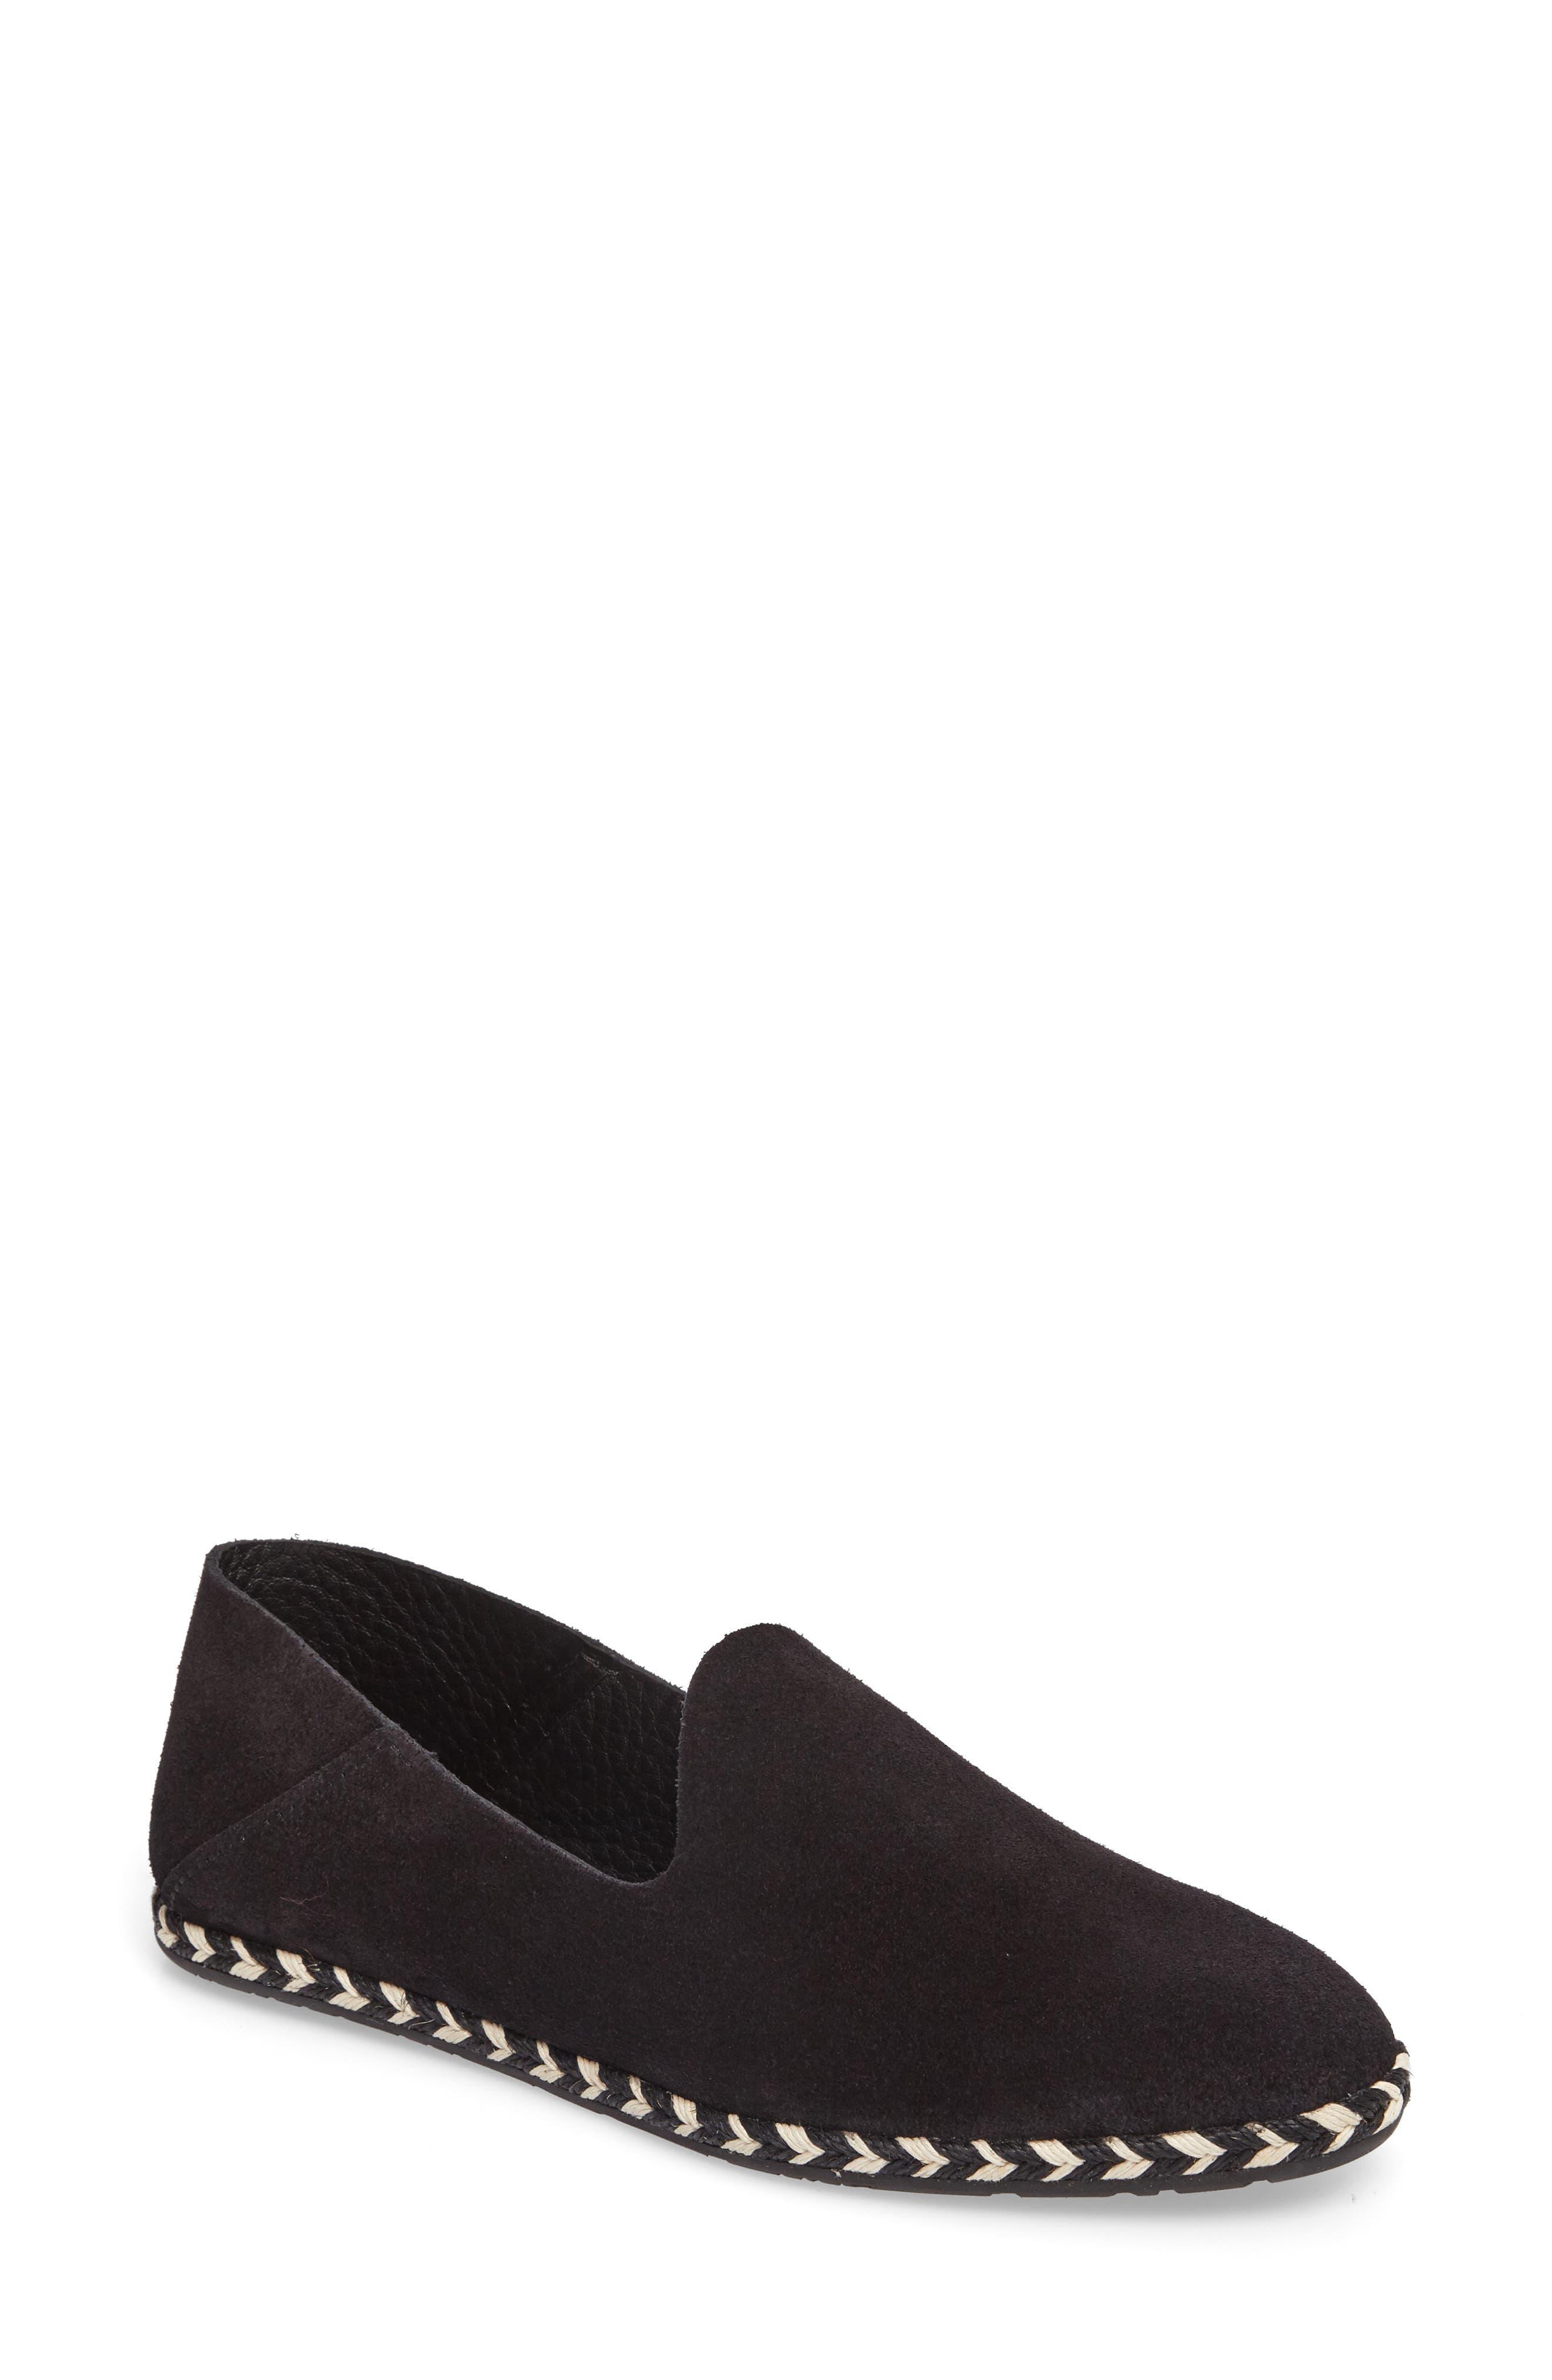 Yuli Convertible Woven Loafer,                         Main,                         color, BLACK